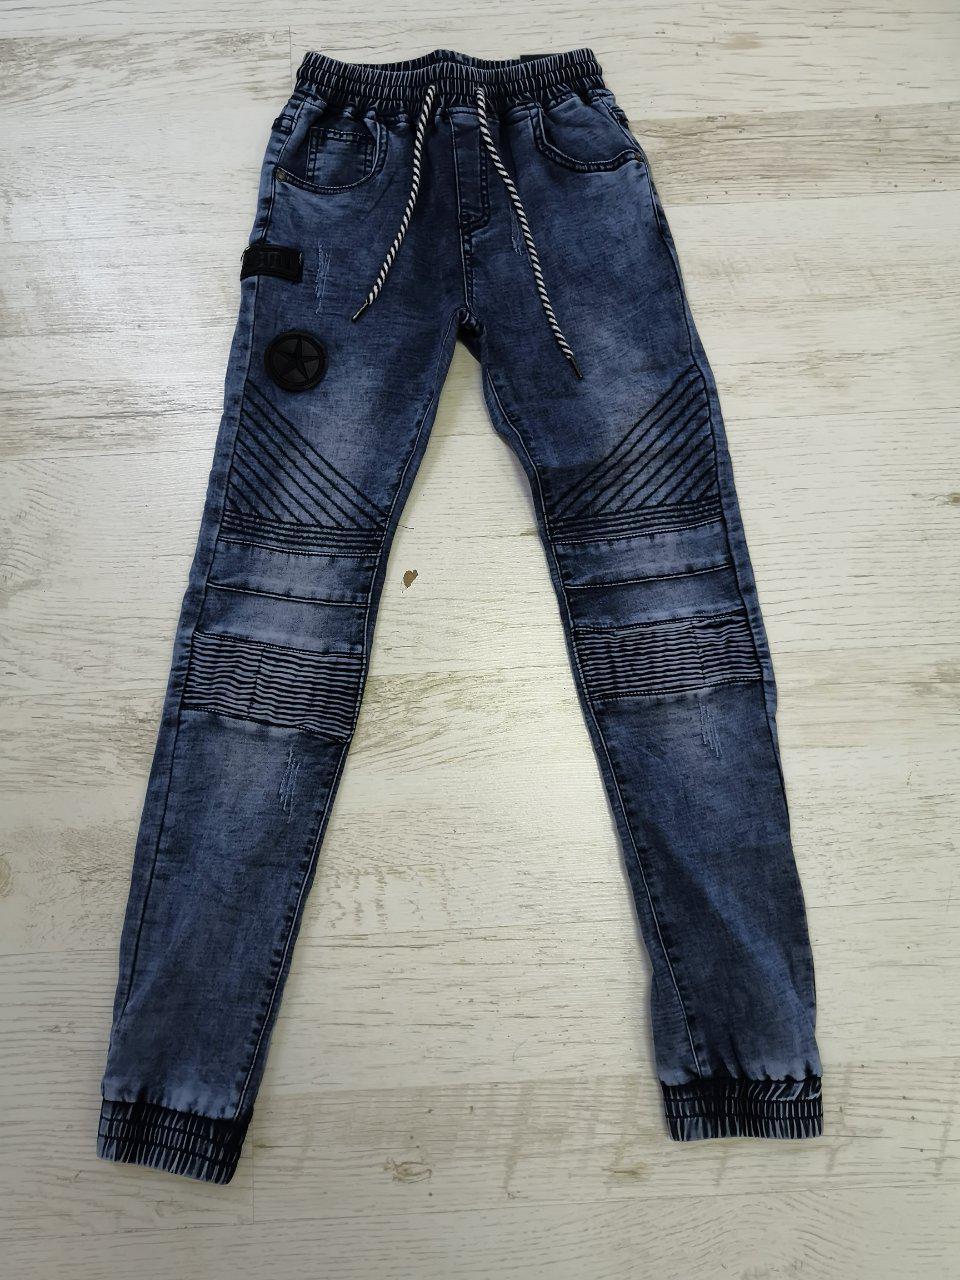 Брюки под джинс для мальчиков Seagull 134-164 р.р.